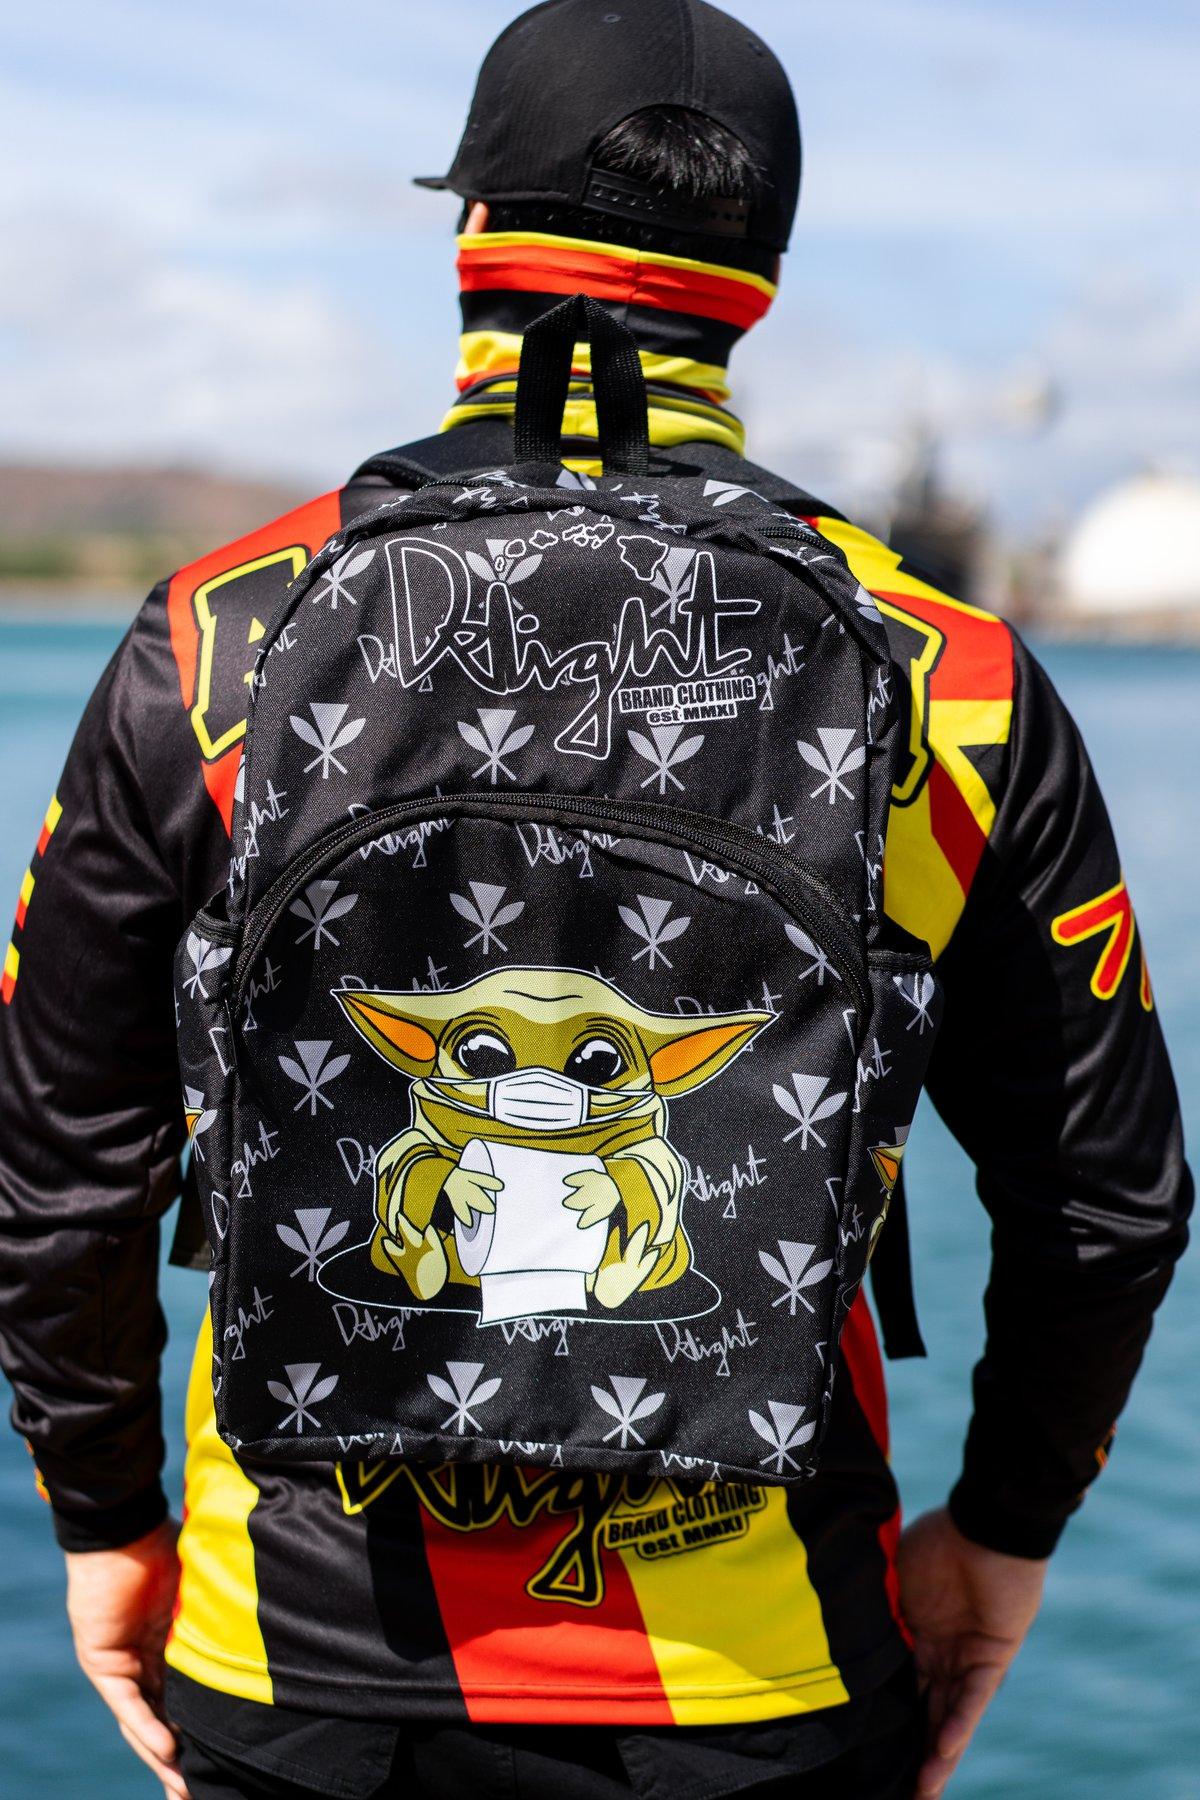 Delight Baby Yoda Backpack